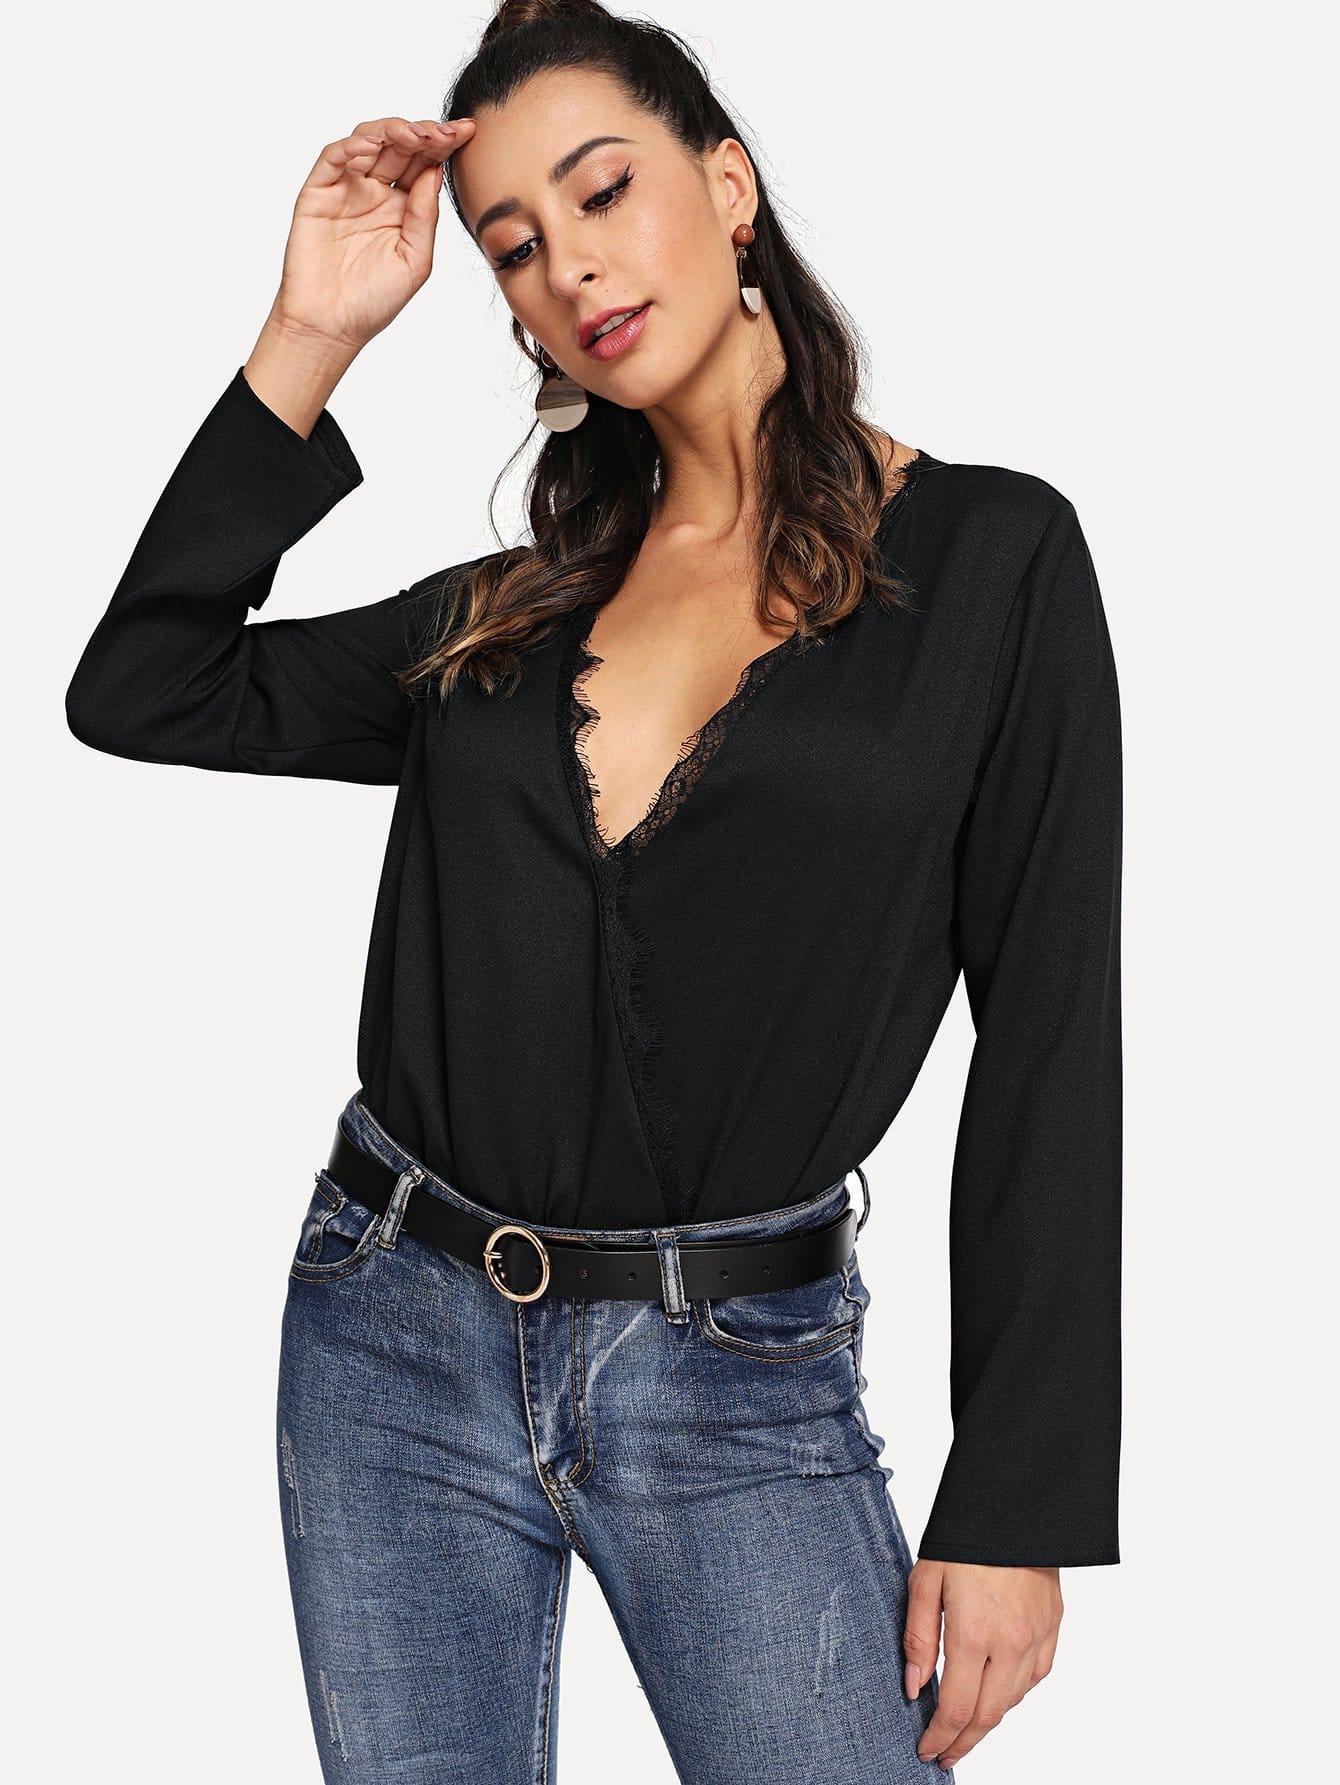 Купить Вставки кружева блузка с глубоким вырезом, Gabe, SheIn